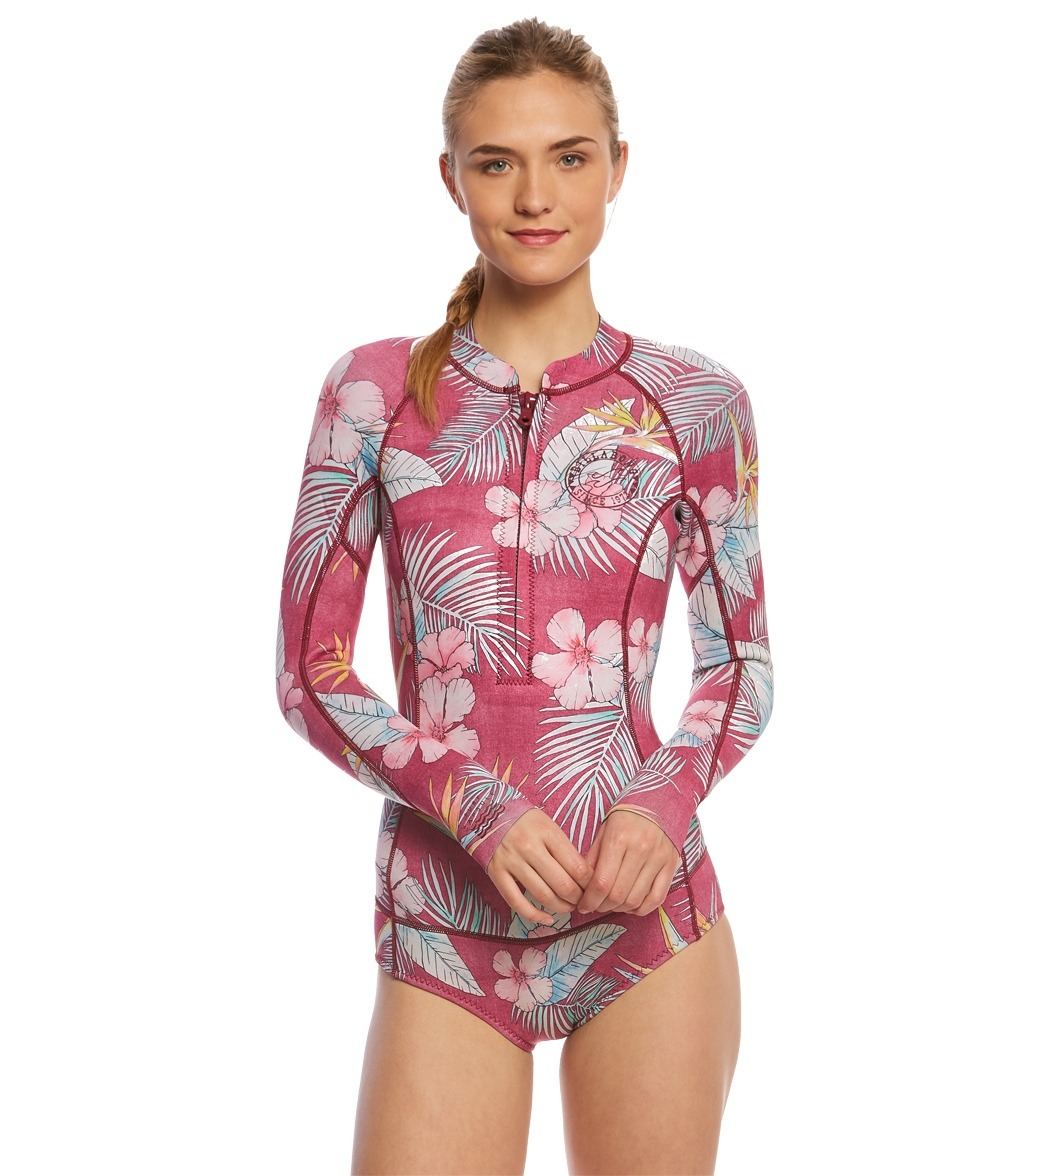 ea844d4e77 ... Billabong Women s 2mm Mas Tropical Salty Dayz Chest Zip Long Sleeve  Spring Suit Wetsuit Play Video. MODEL MEASUREMENTS